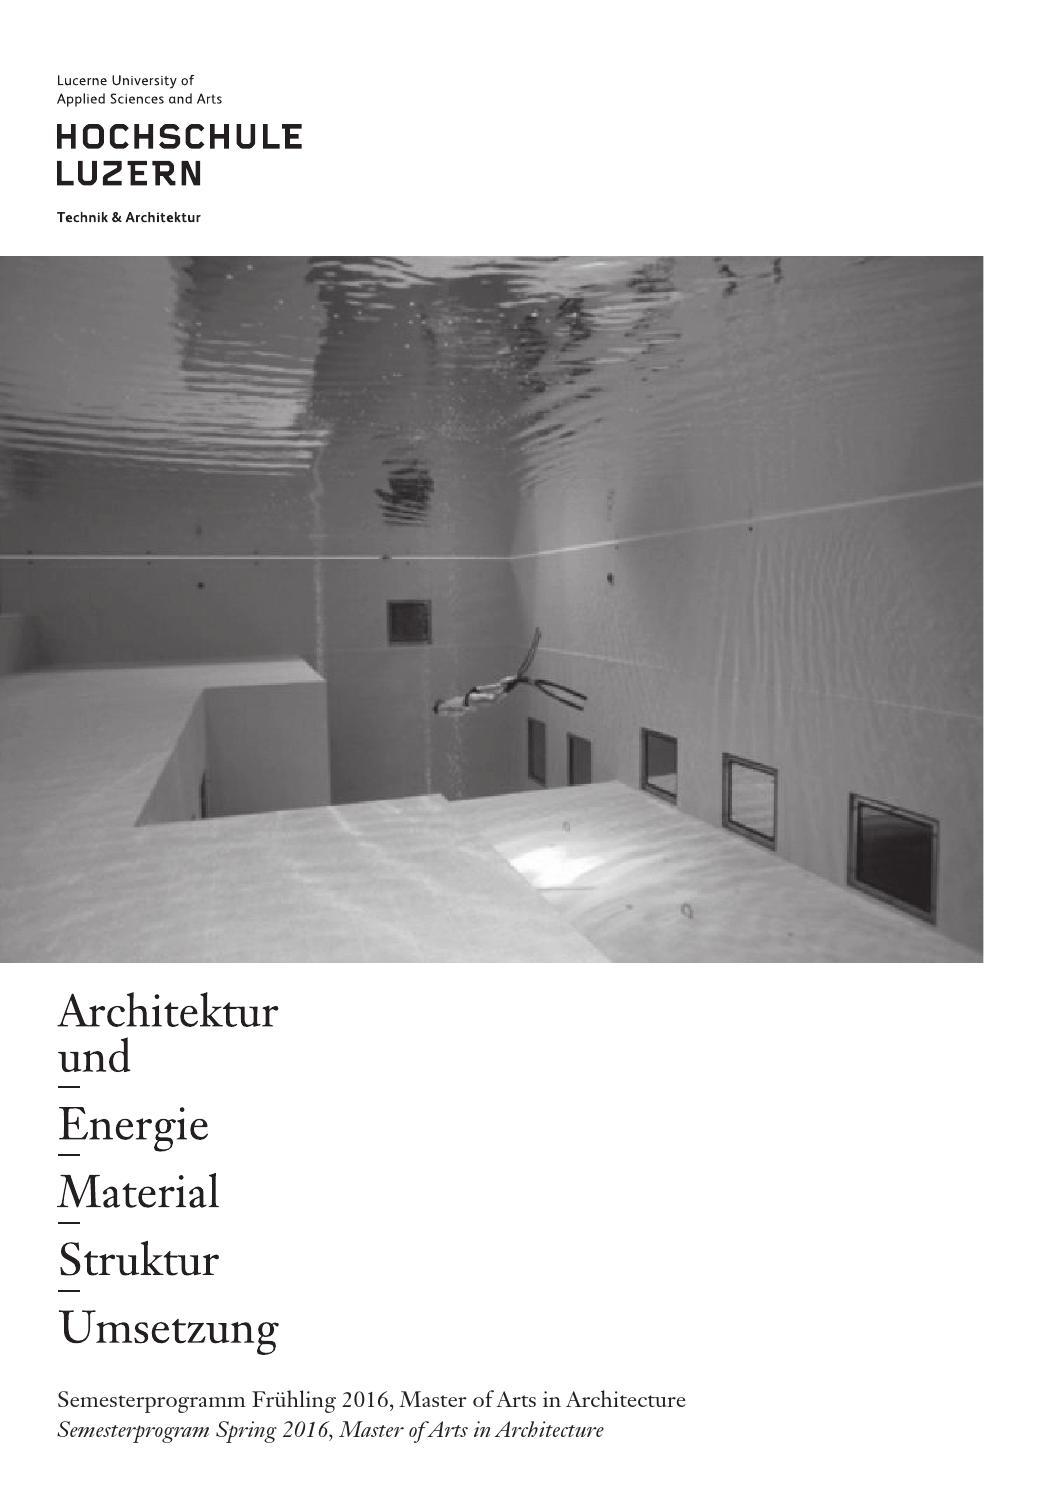 160211 fs16 reader by master architektur issuu for Master architektur